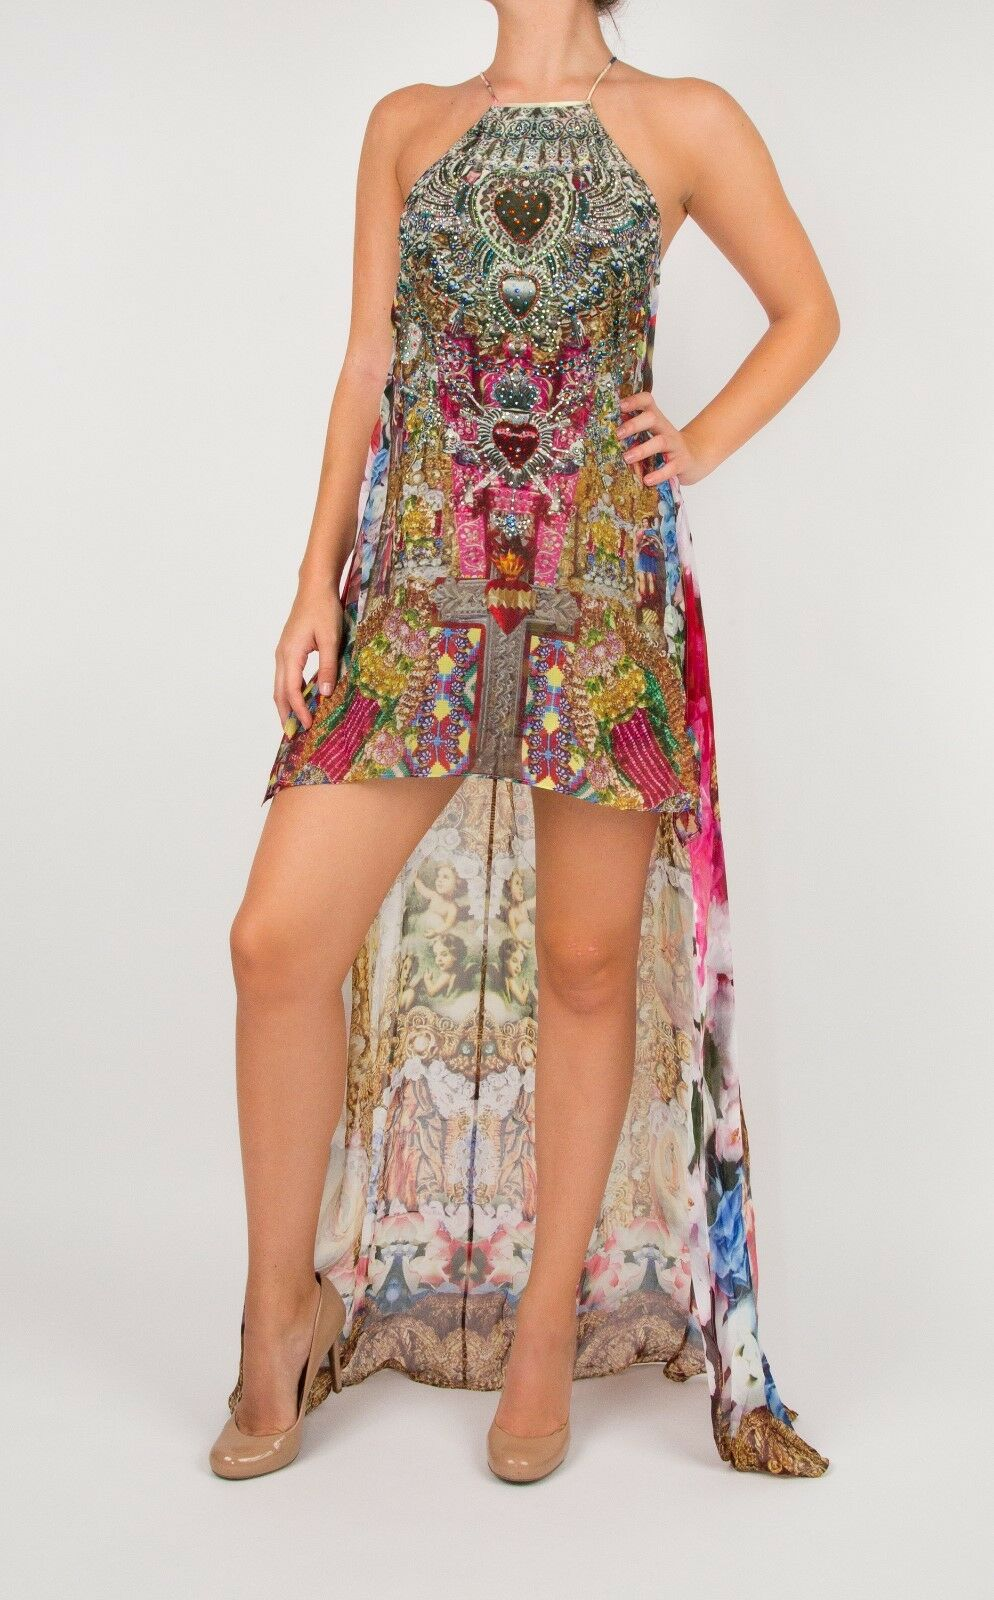 Camilla Franks 'Alerting Perception' Short Sheer Overlay Dress